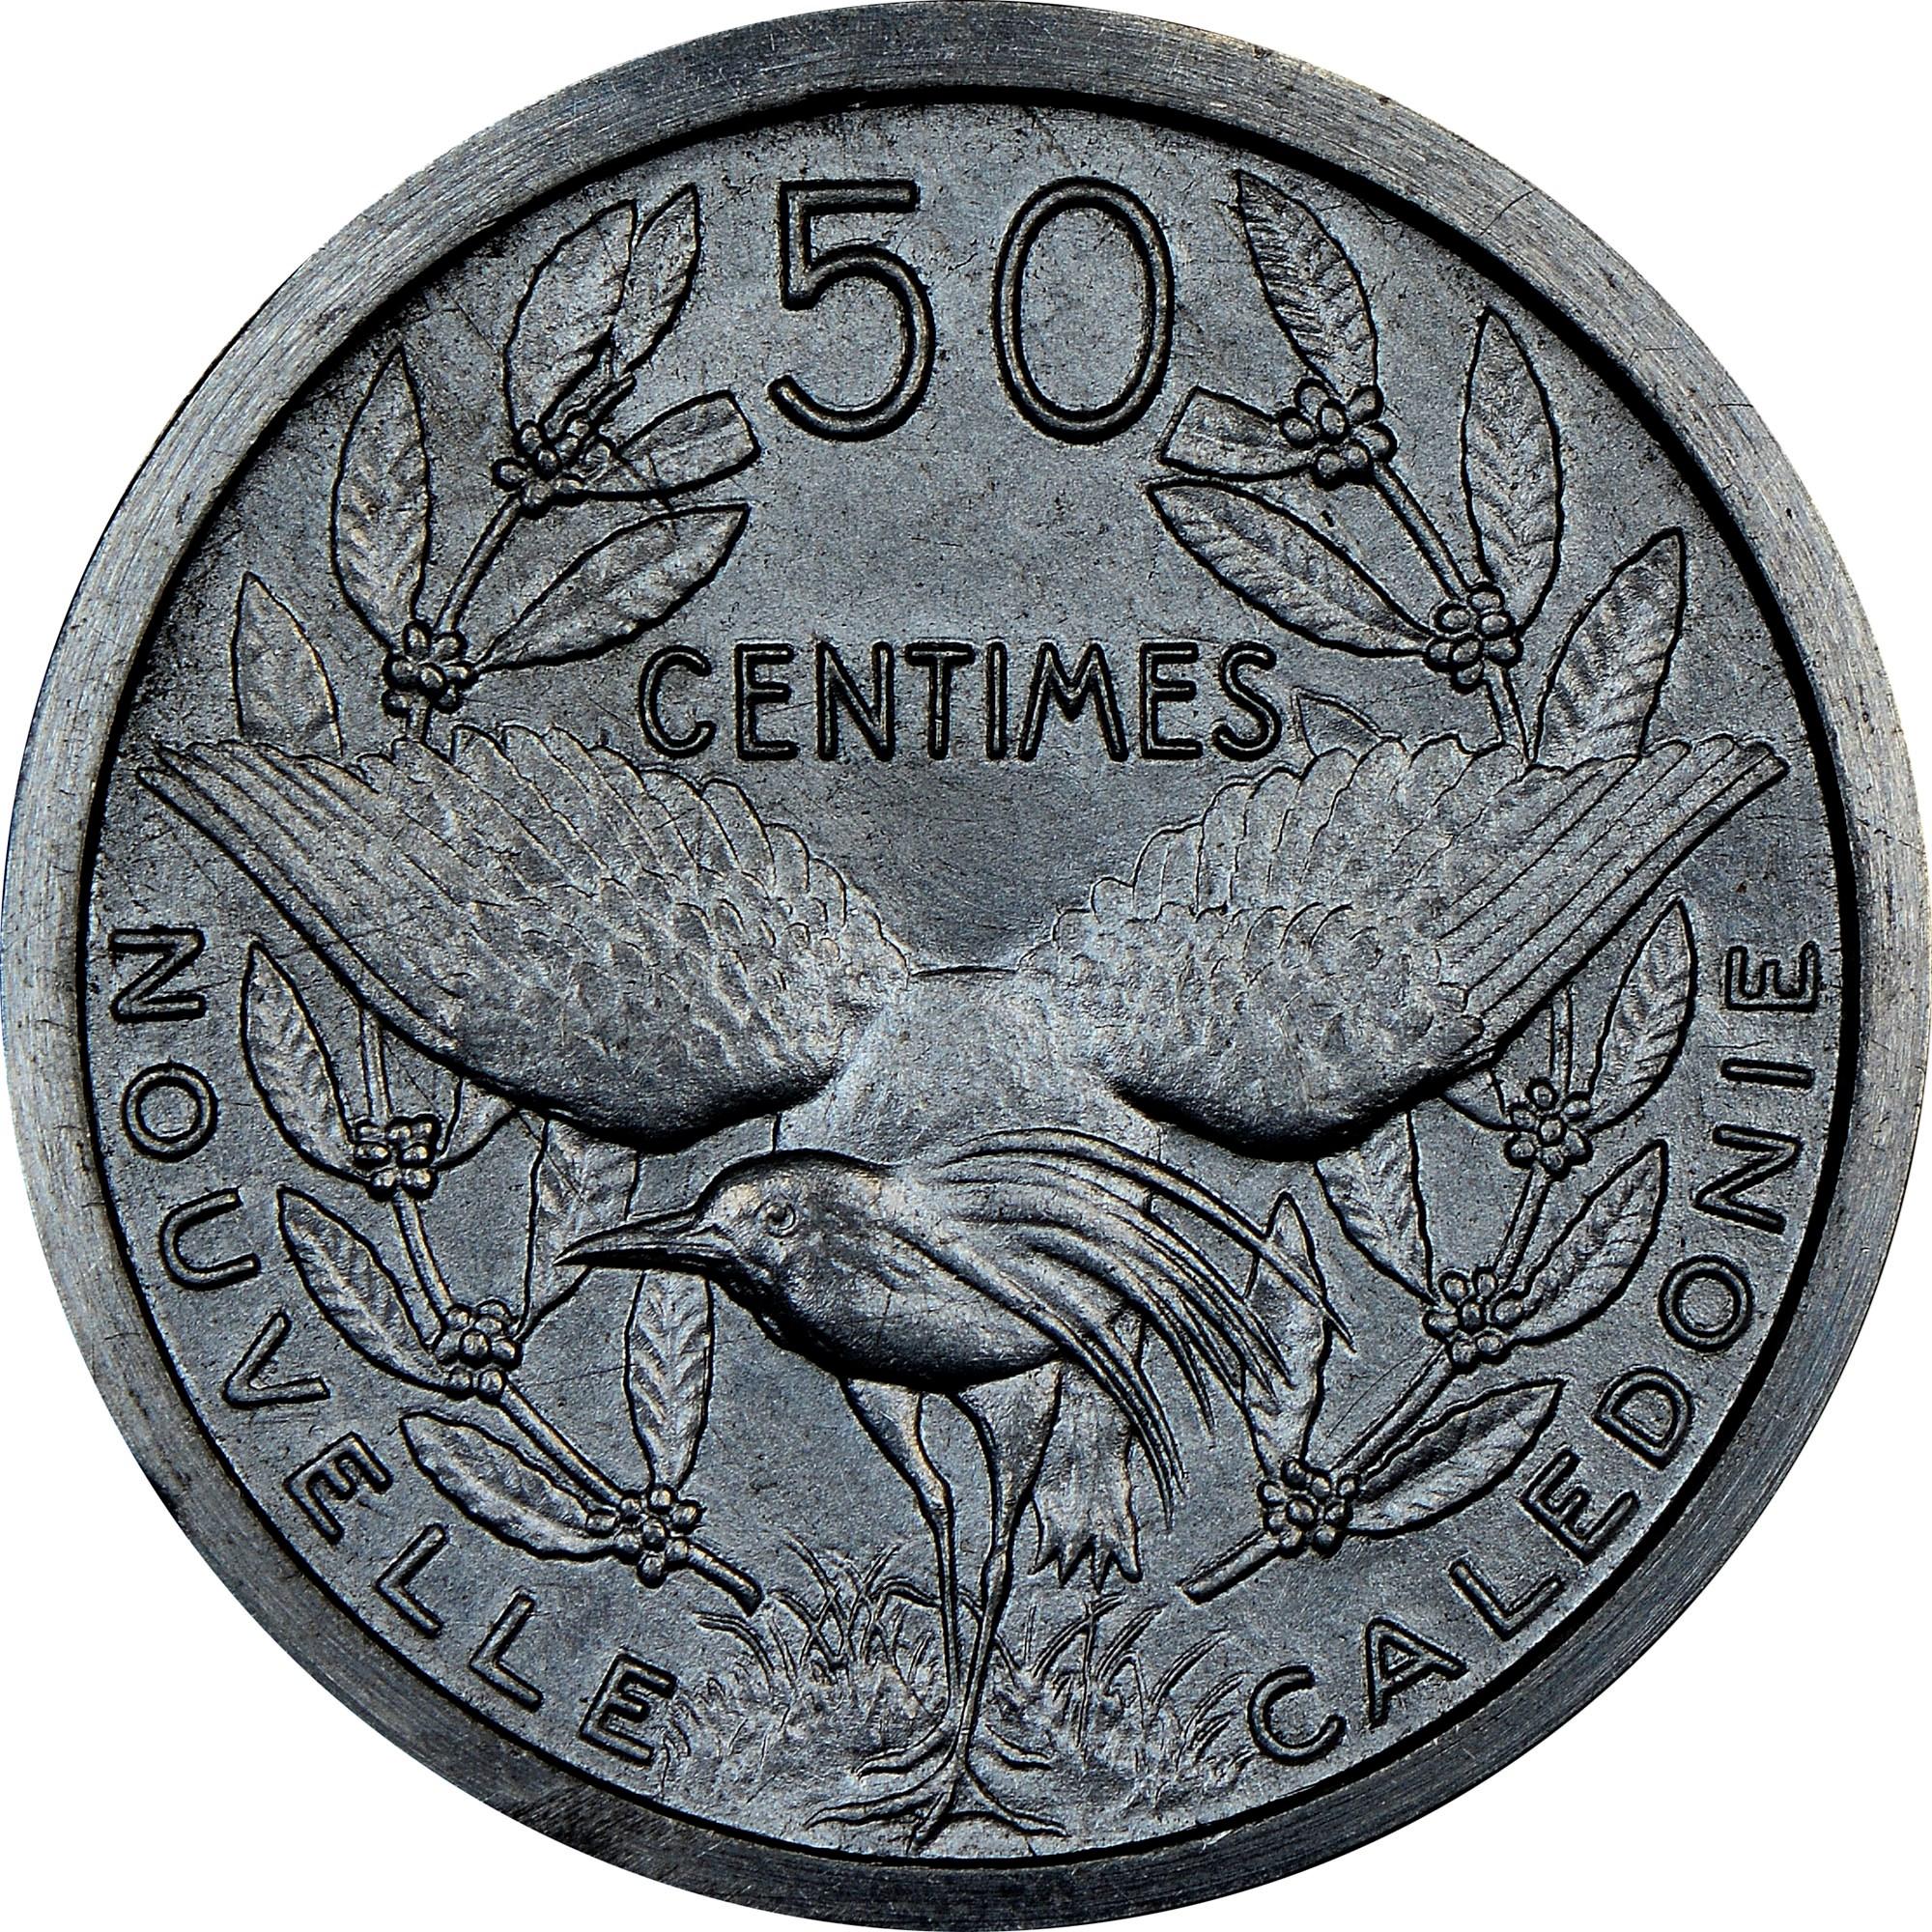 New Caledonia 50 Centimes reverse